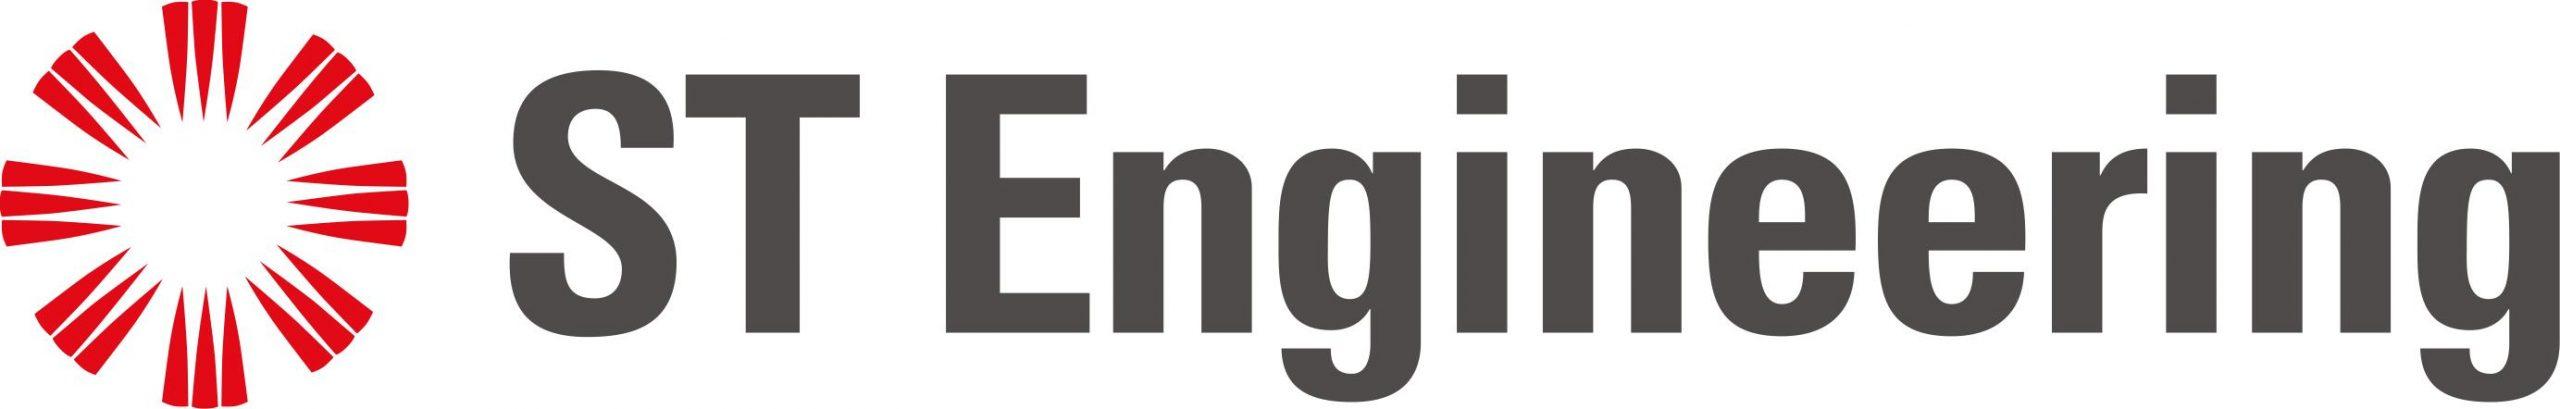 STEngineering logo